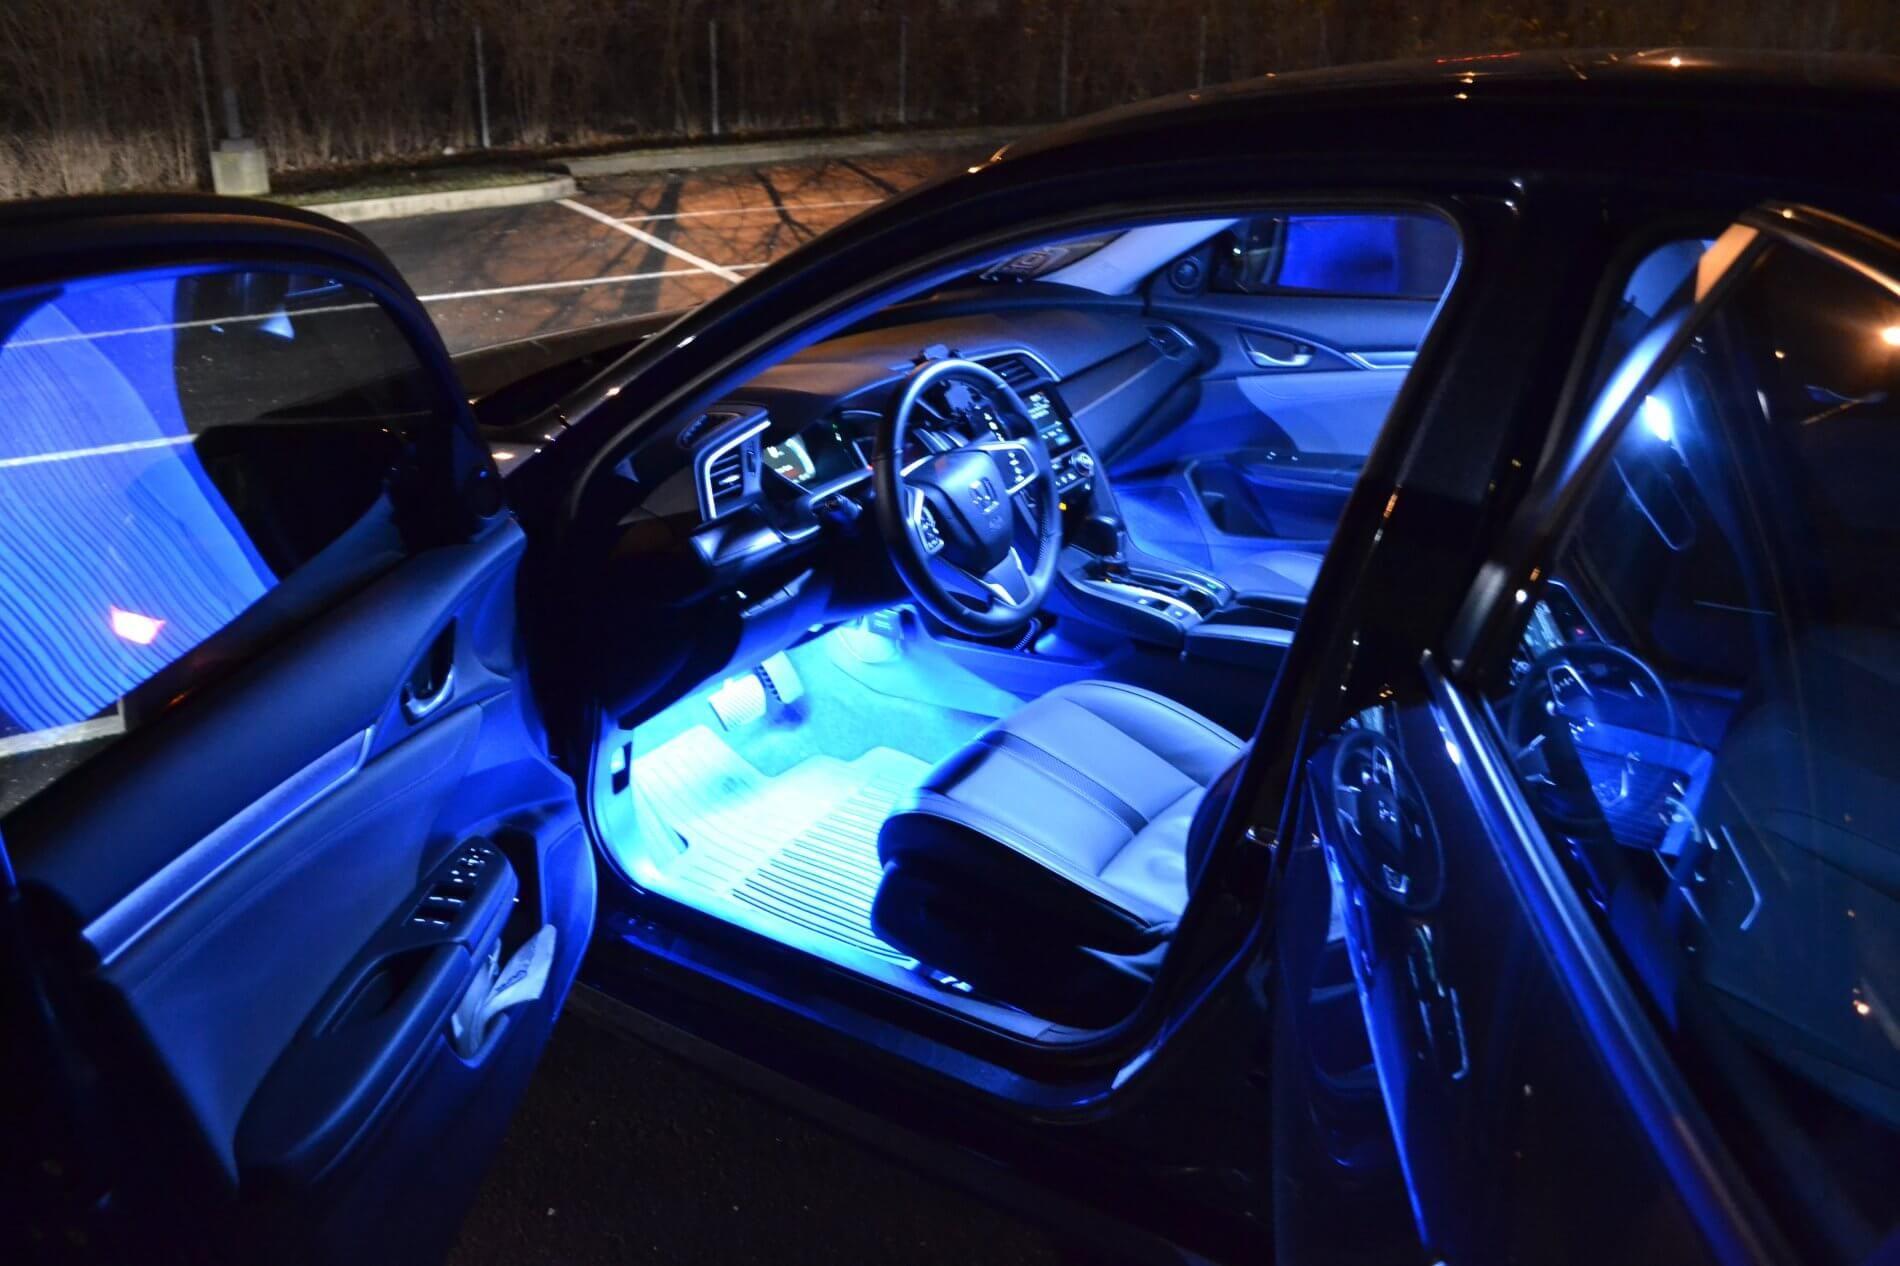 threads lights galaxy honda ledglow interior lighting dsc civic kit forum jpg rider